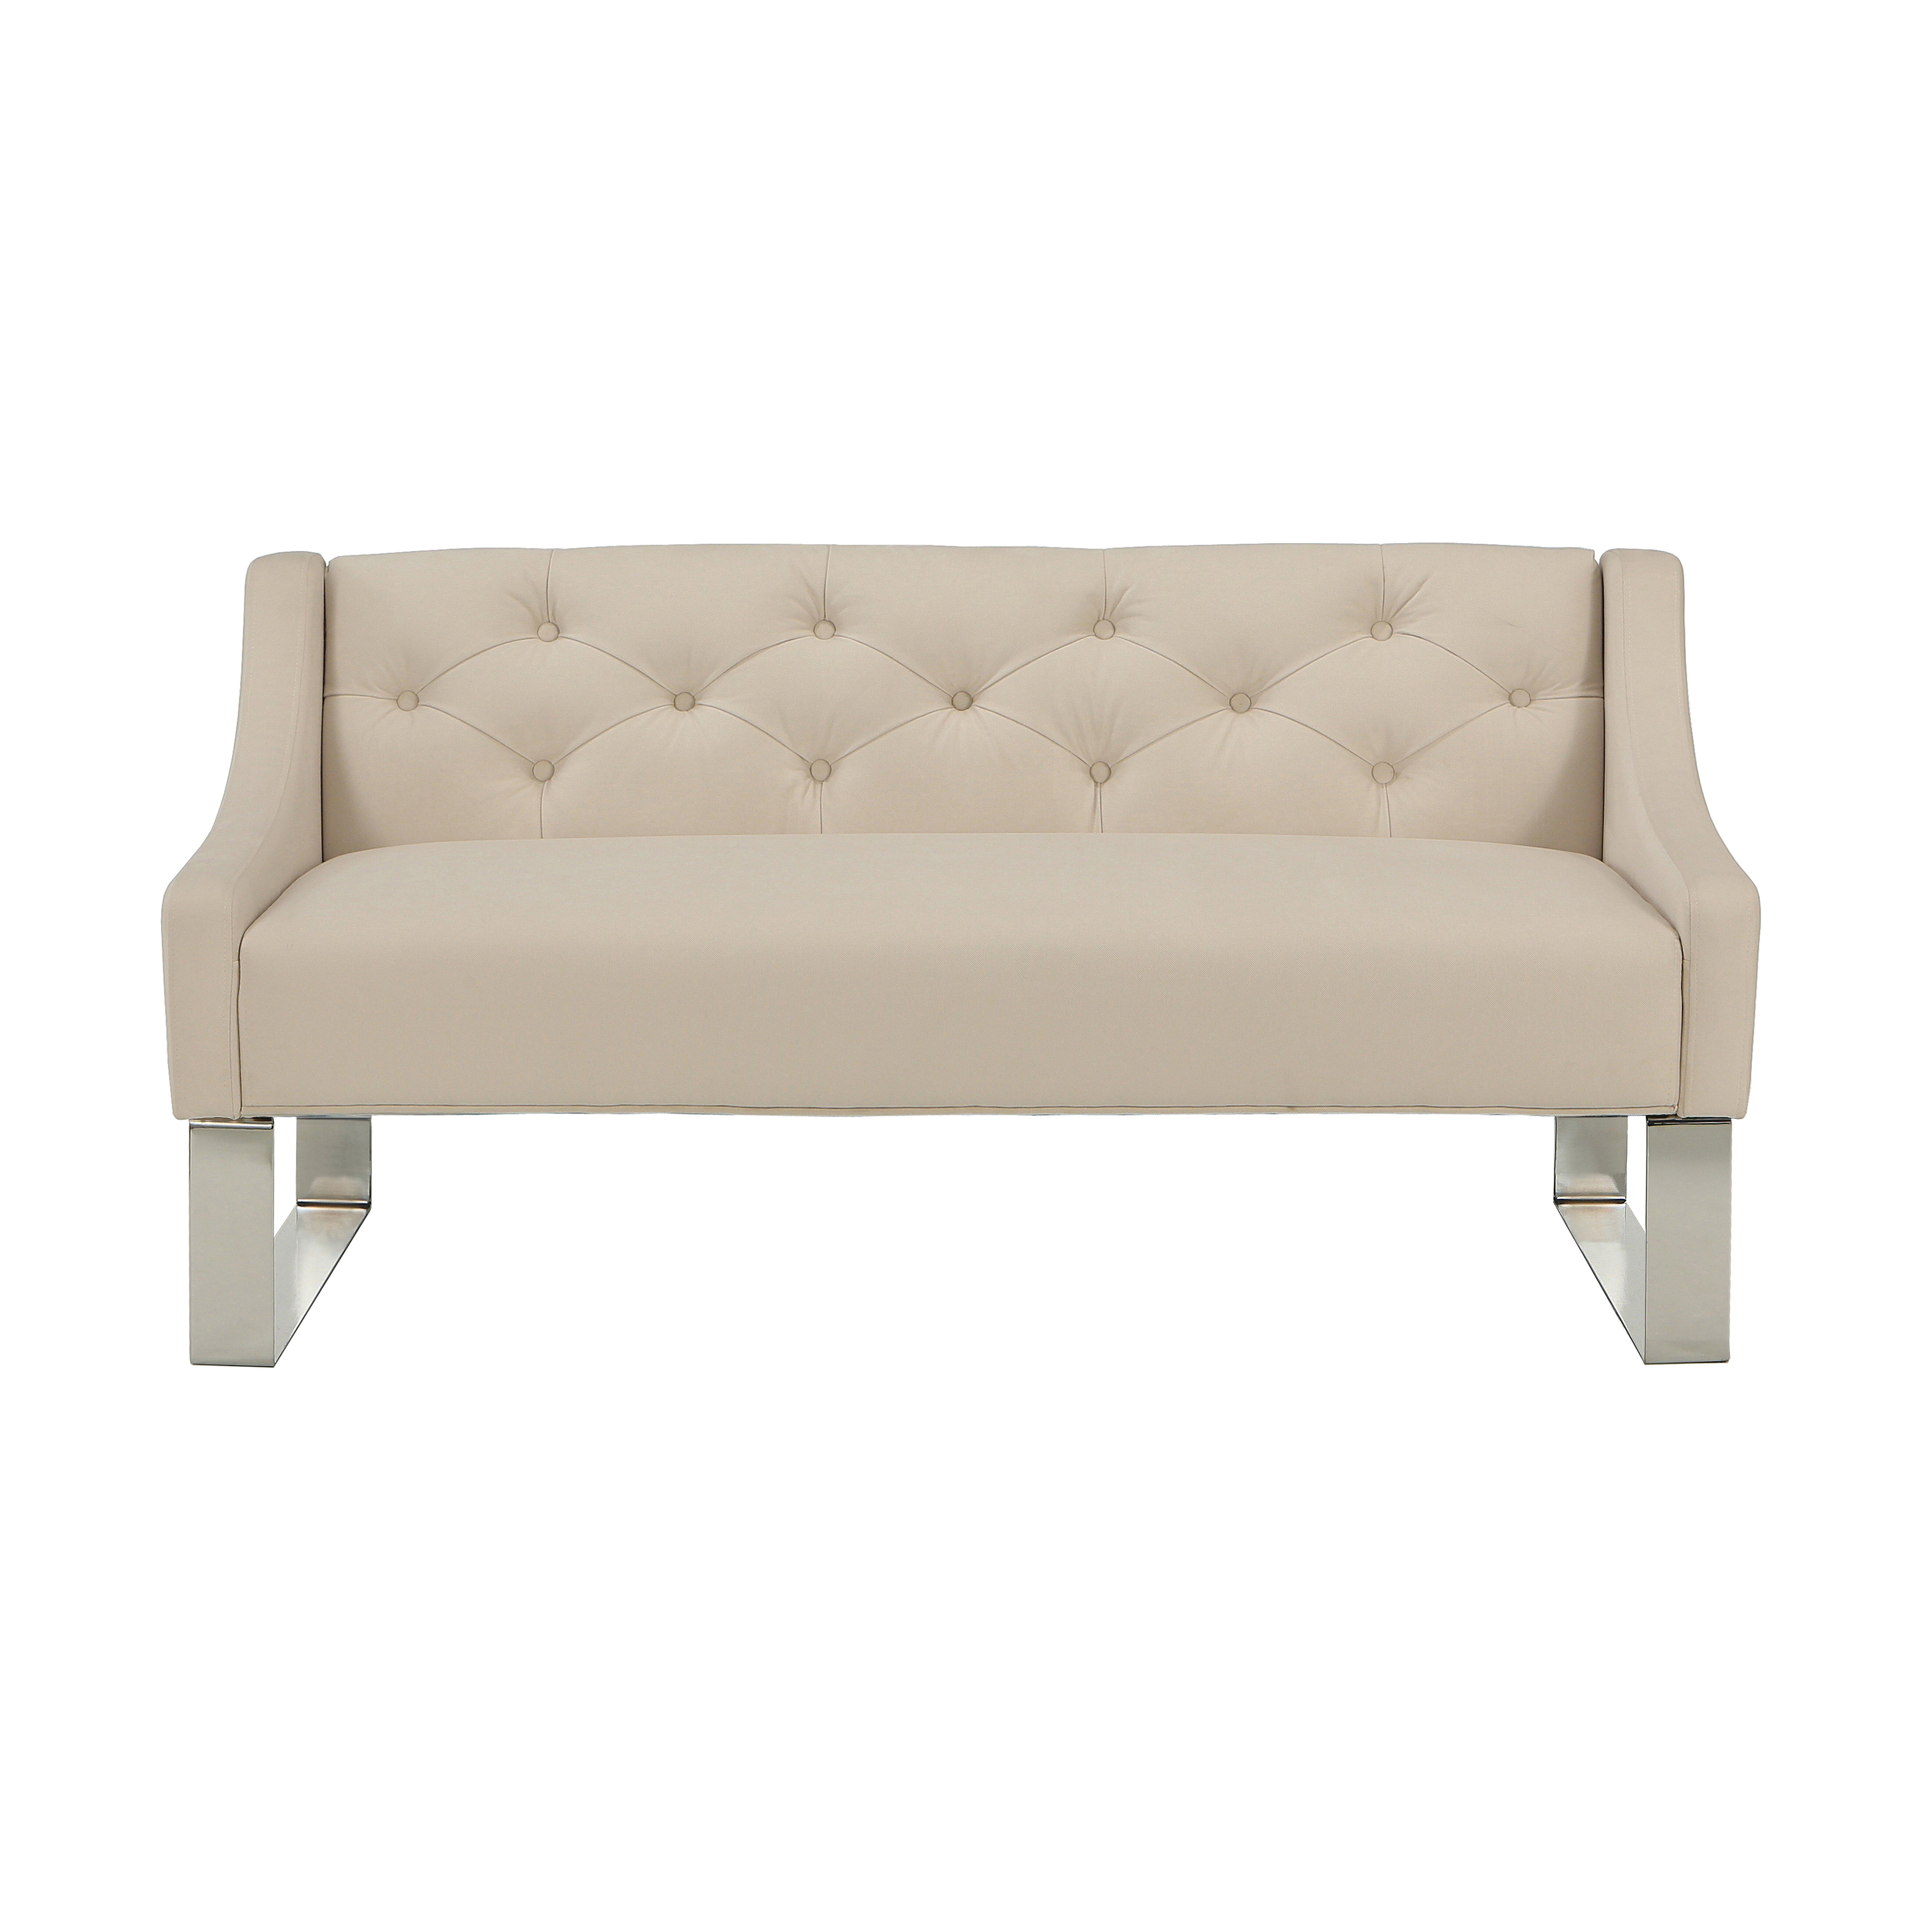 Republicdesignhouse Inspirations Upholstered Bedroom Bench Wayfair